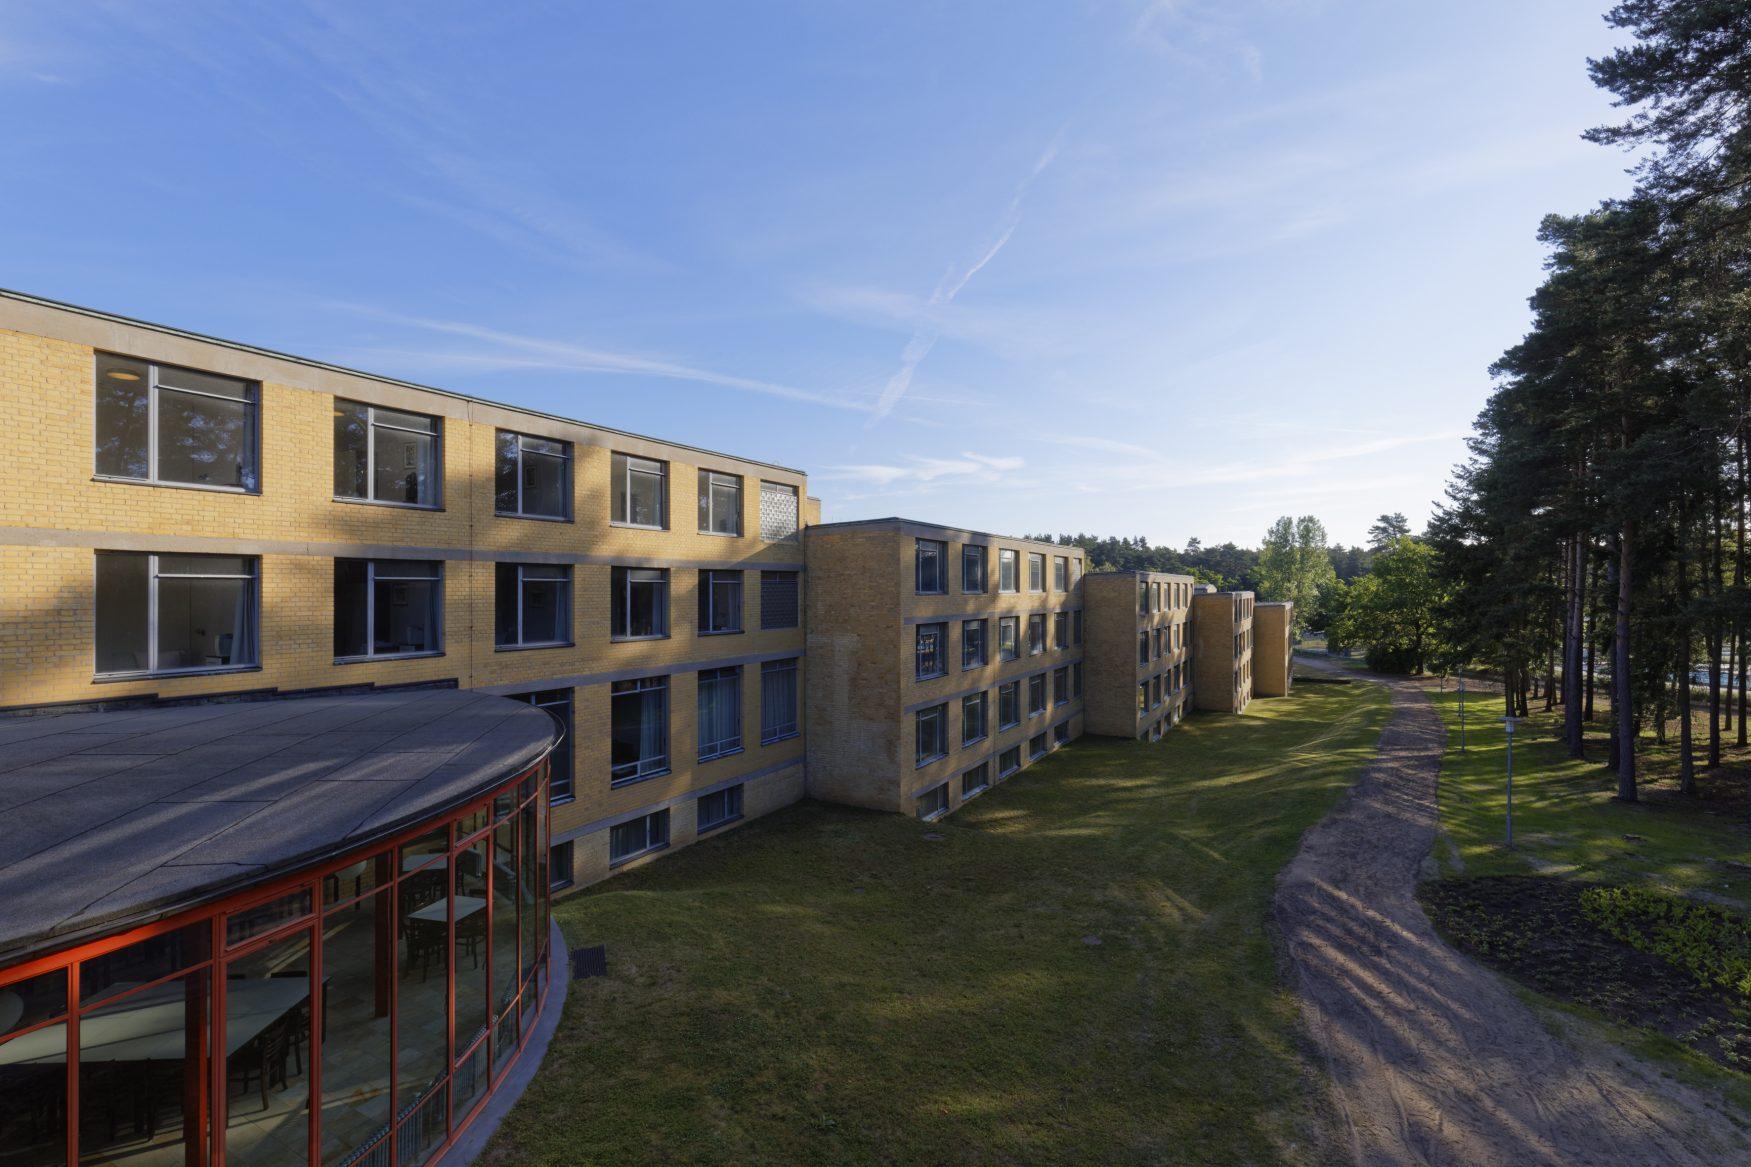 Bauhaus Denkmal Bundesschule Bernau: Blick auf das Internatsgebäude, Foto: Eberle & Eisfeld